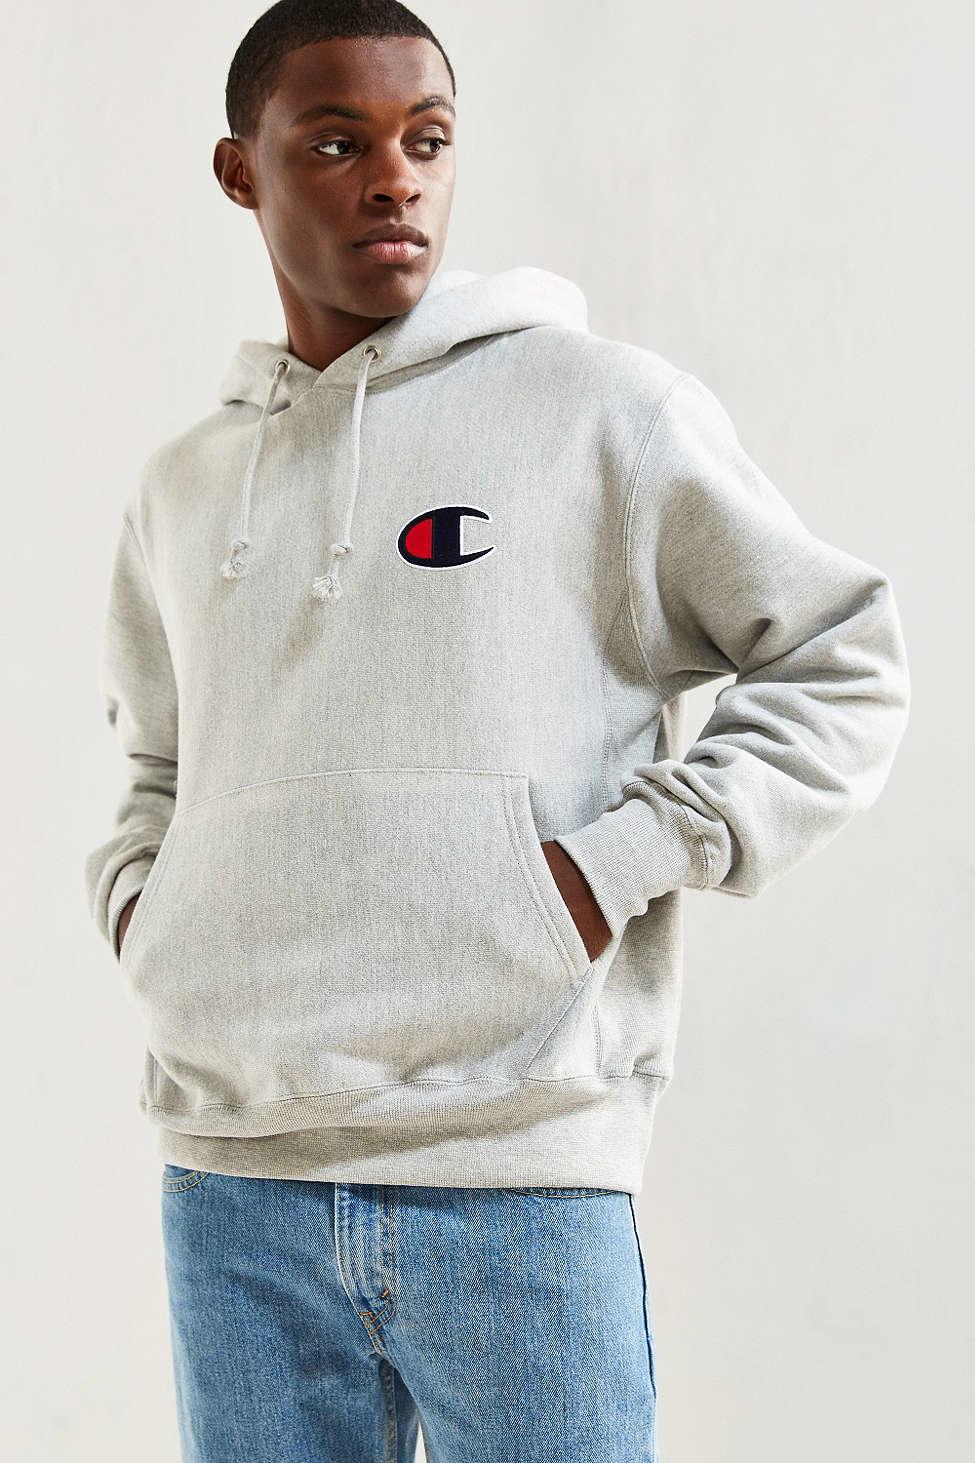 20d23f950b4 Lyst - Champion Reverse Weave Large C Hoodie Sweatshirt in Gray for Men